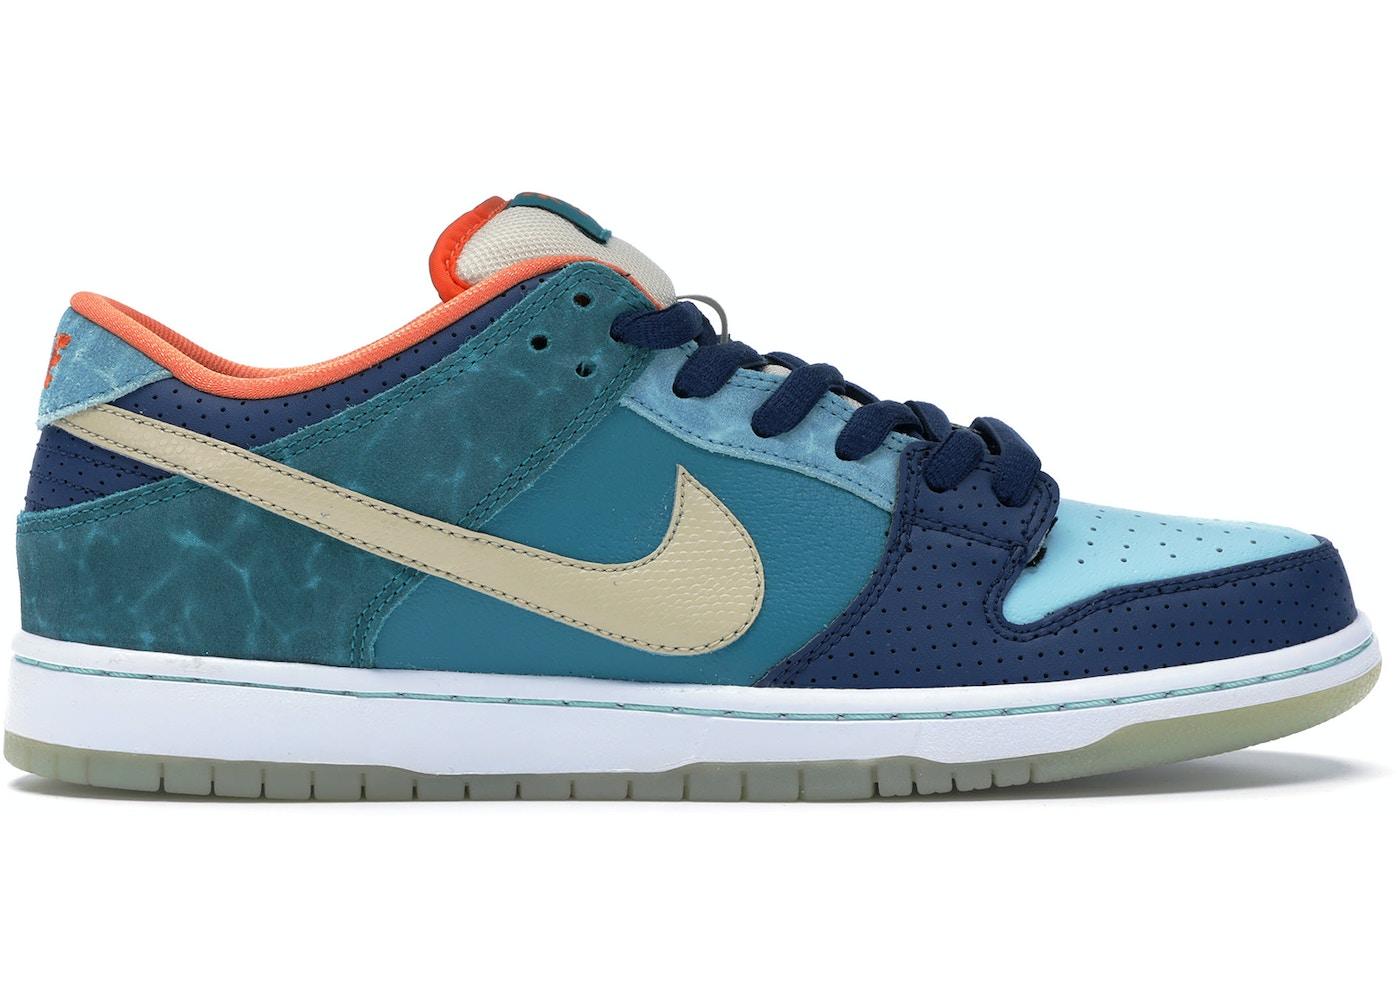 sports shoes 69a9e 5792d Nike Dunk SB Low MIA Skate Shop - 504750-474